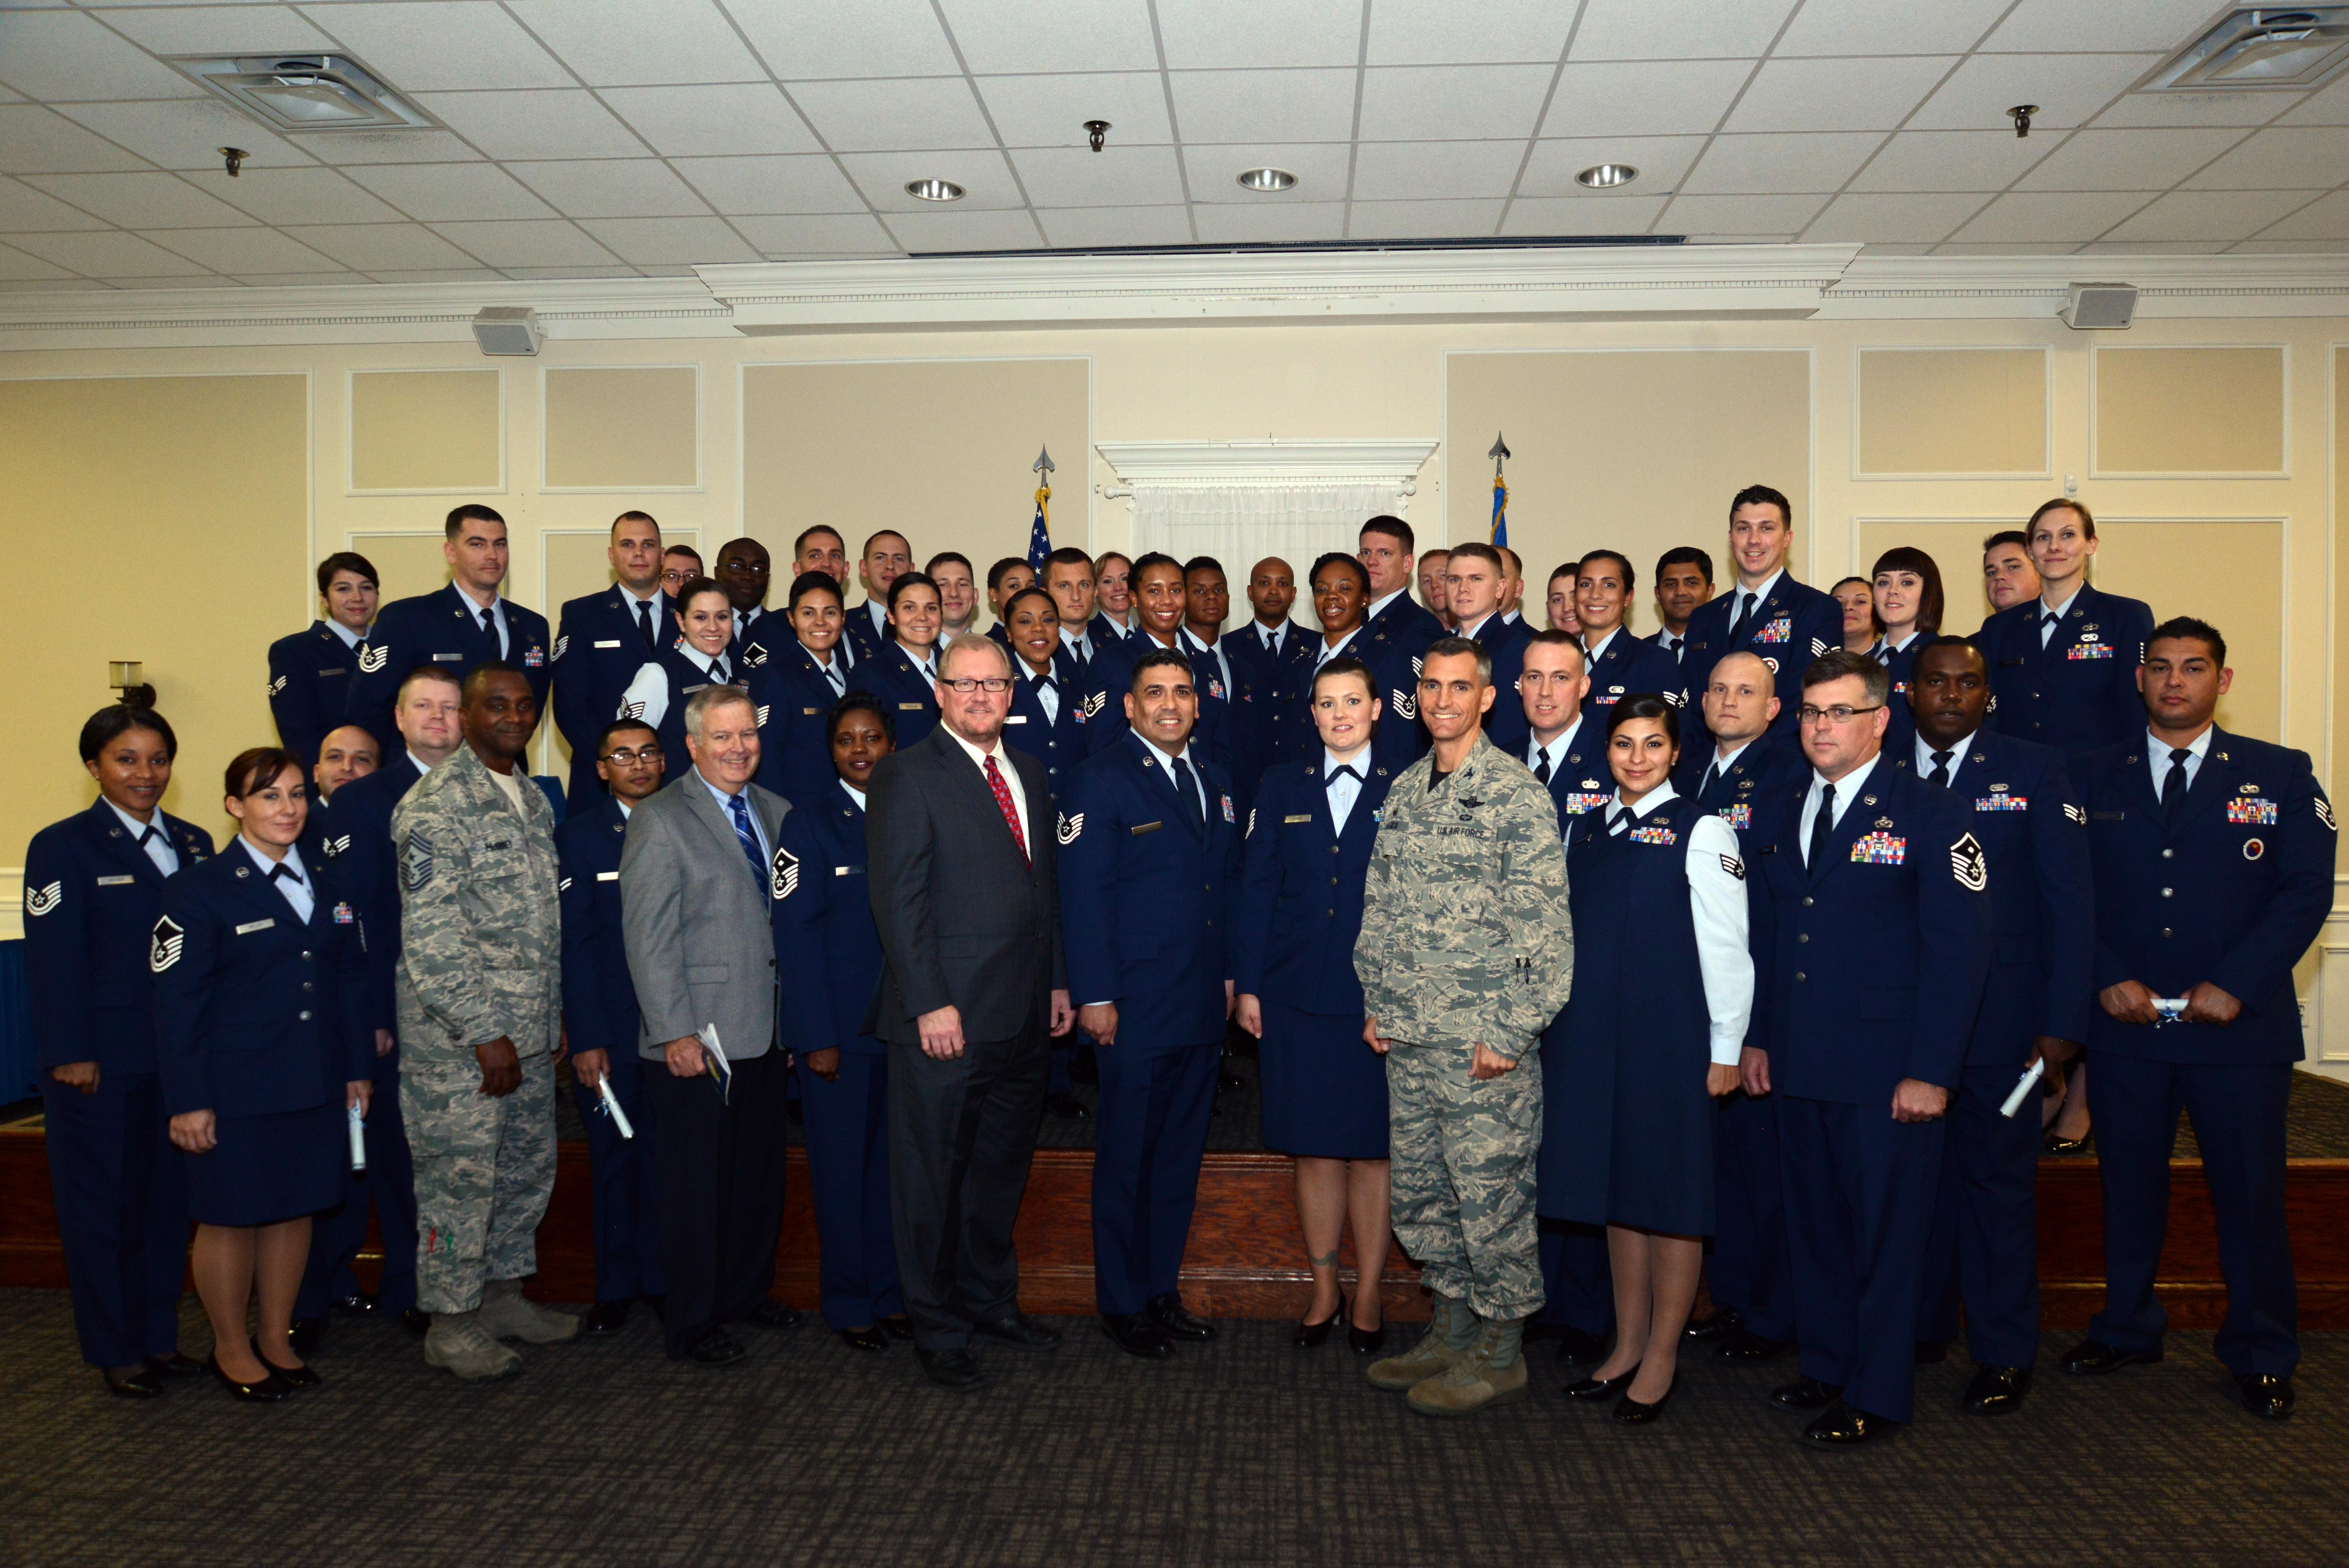 833rd aero squadron - Airmen Achieve Educational Milestone